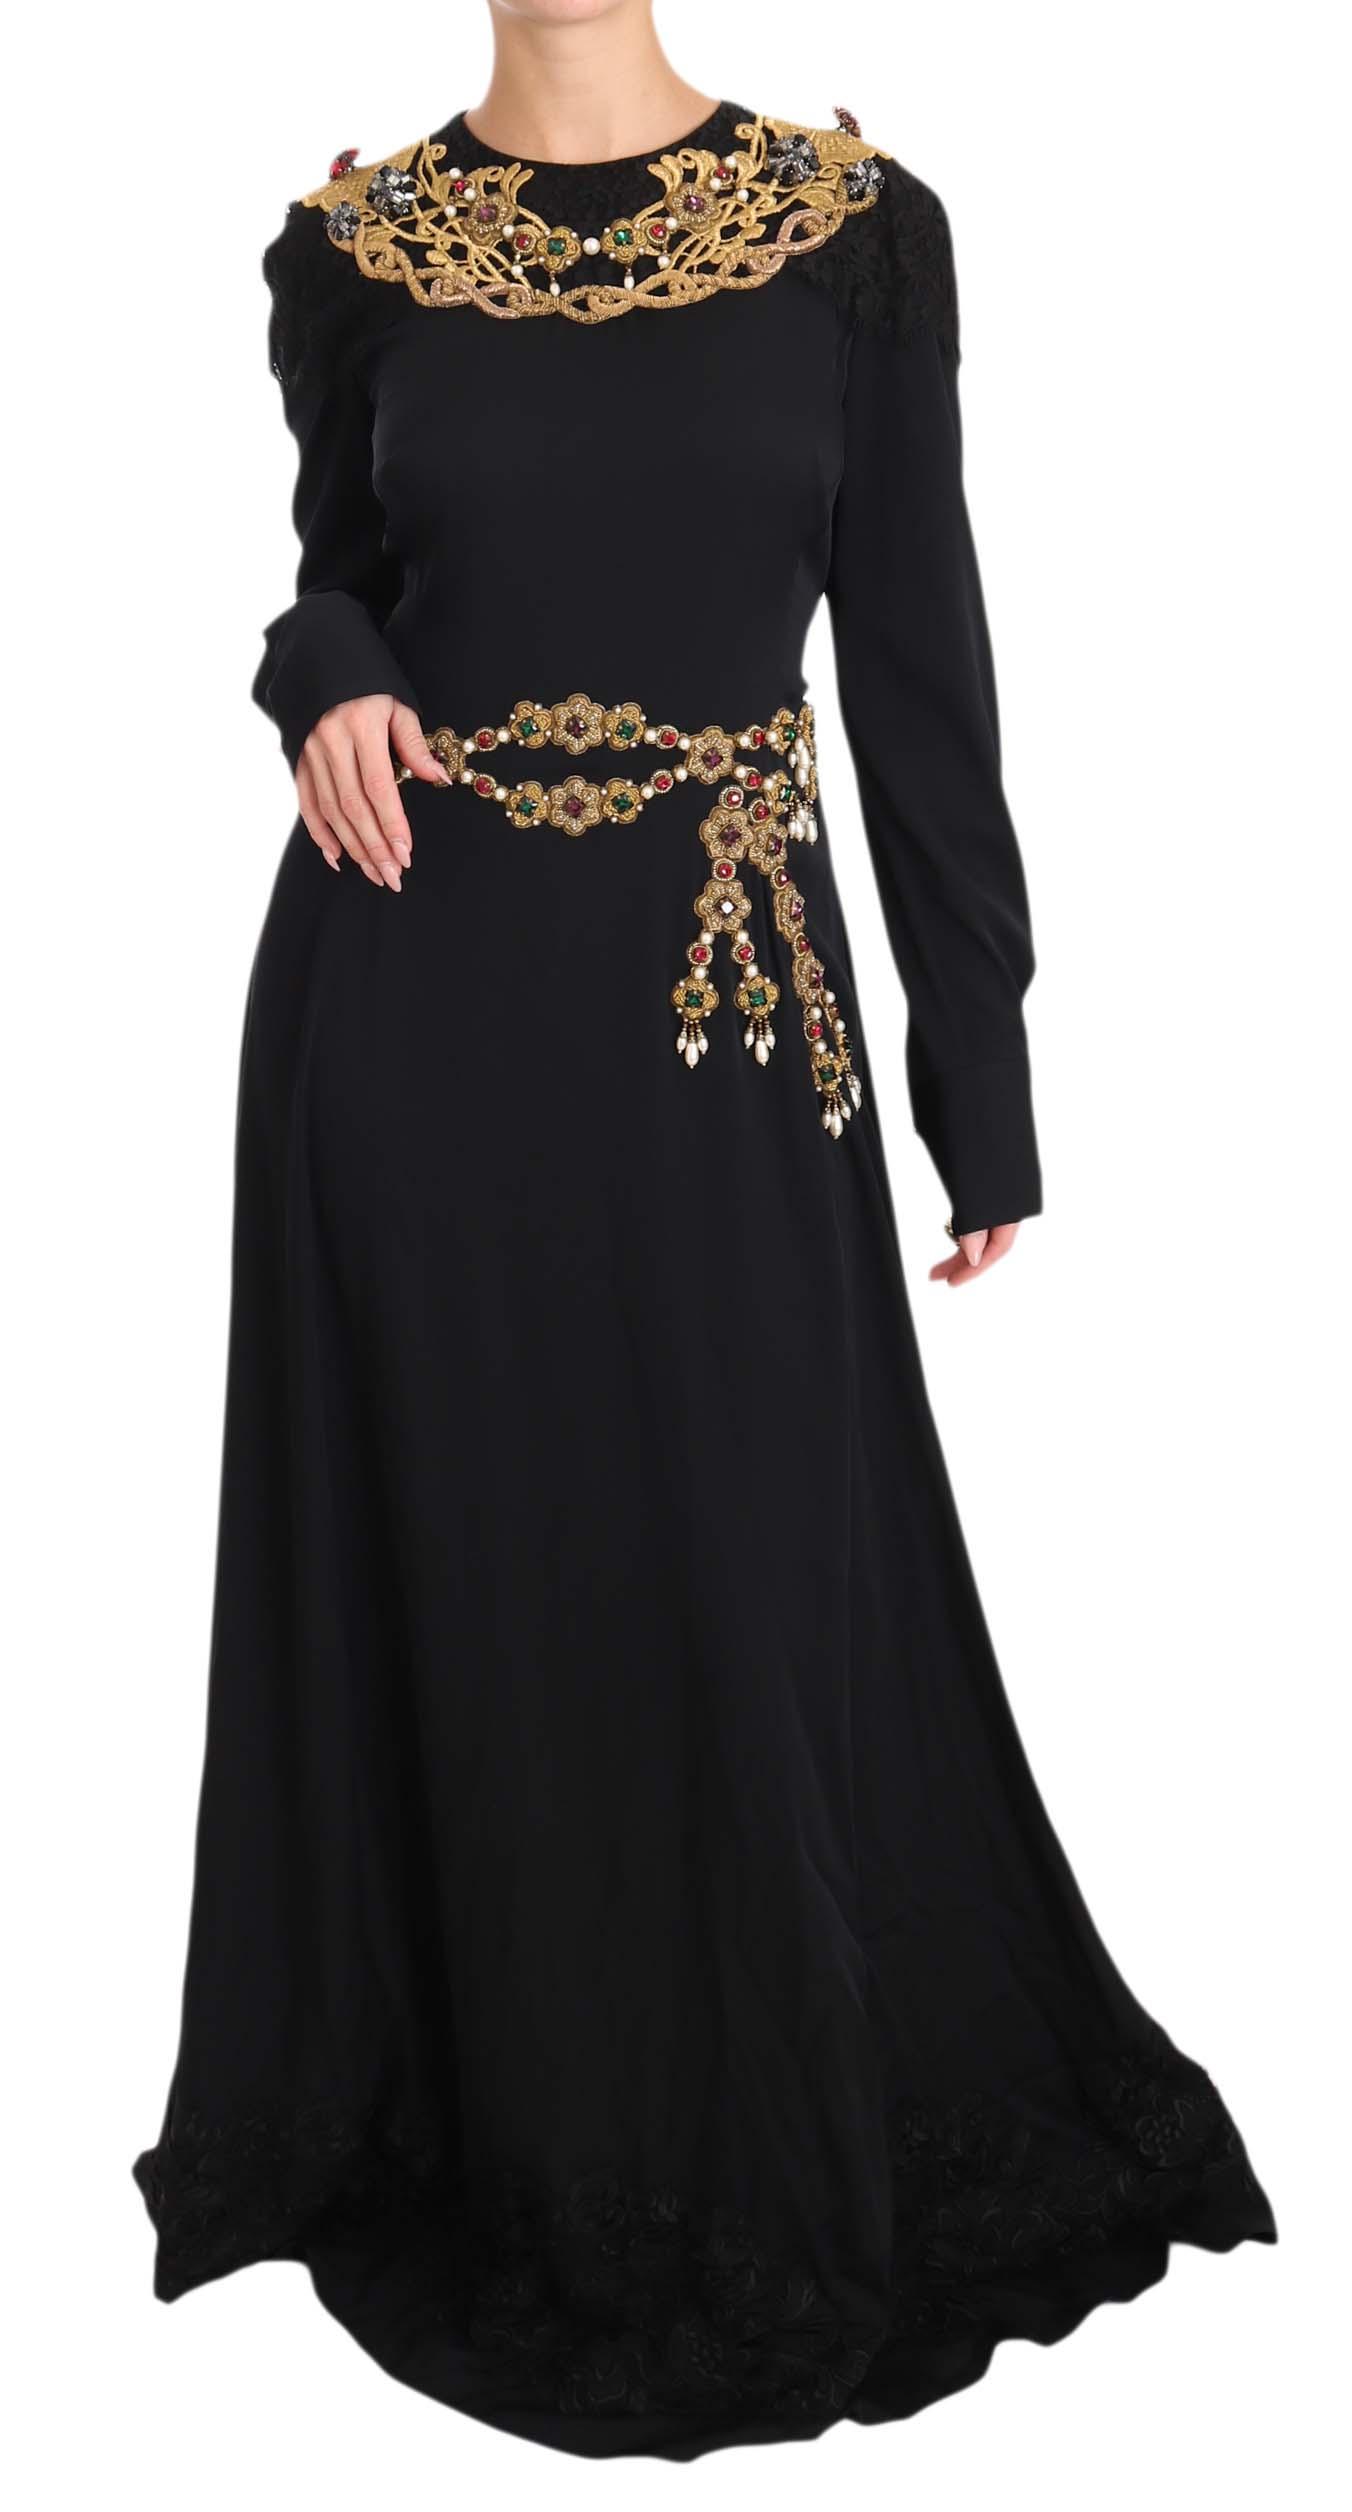 Dolce & Gabbana Women's Silk Stretch Crystal Dress Black DR1587 - IT38   S